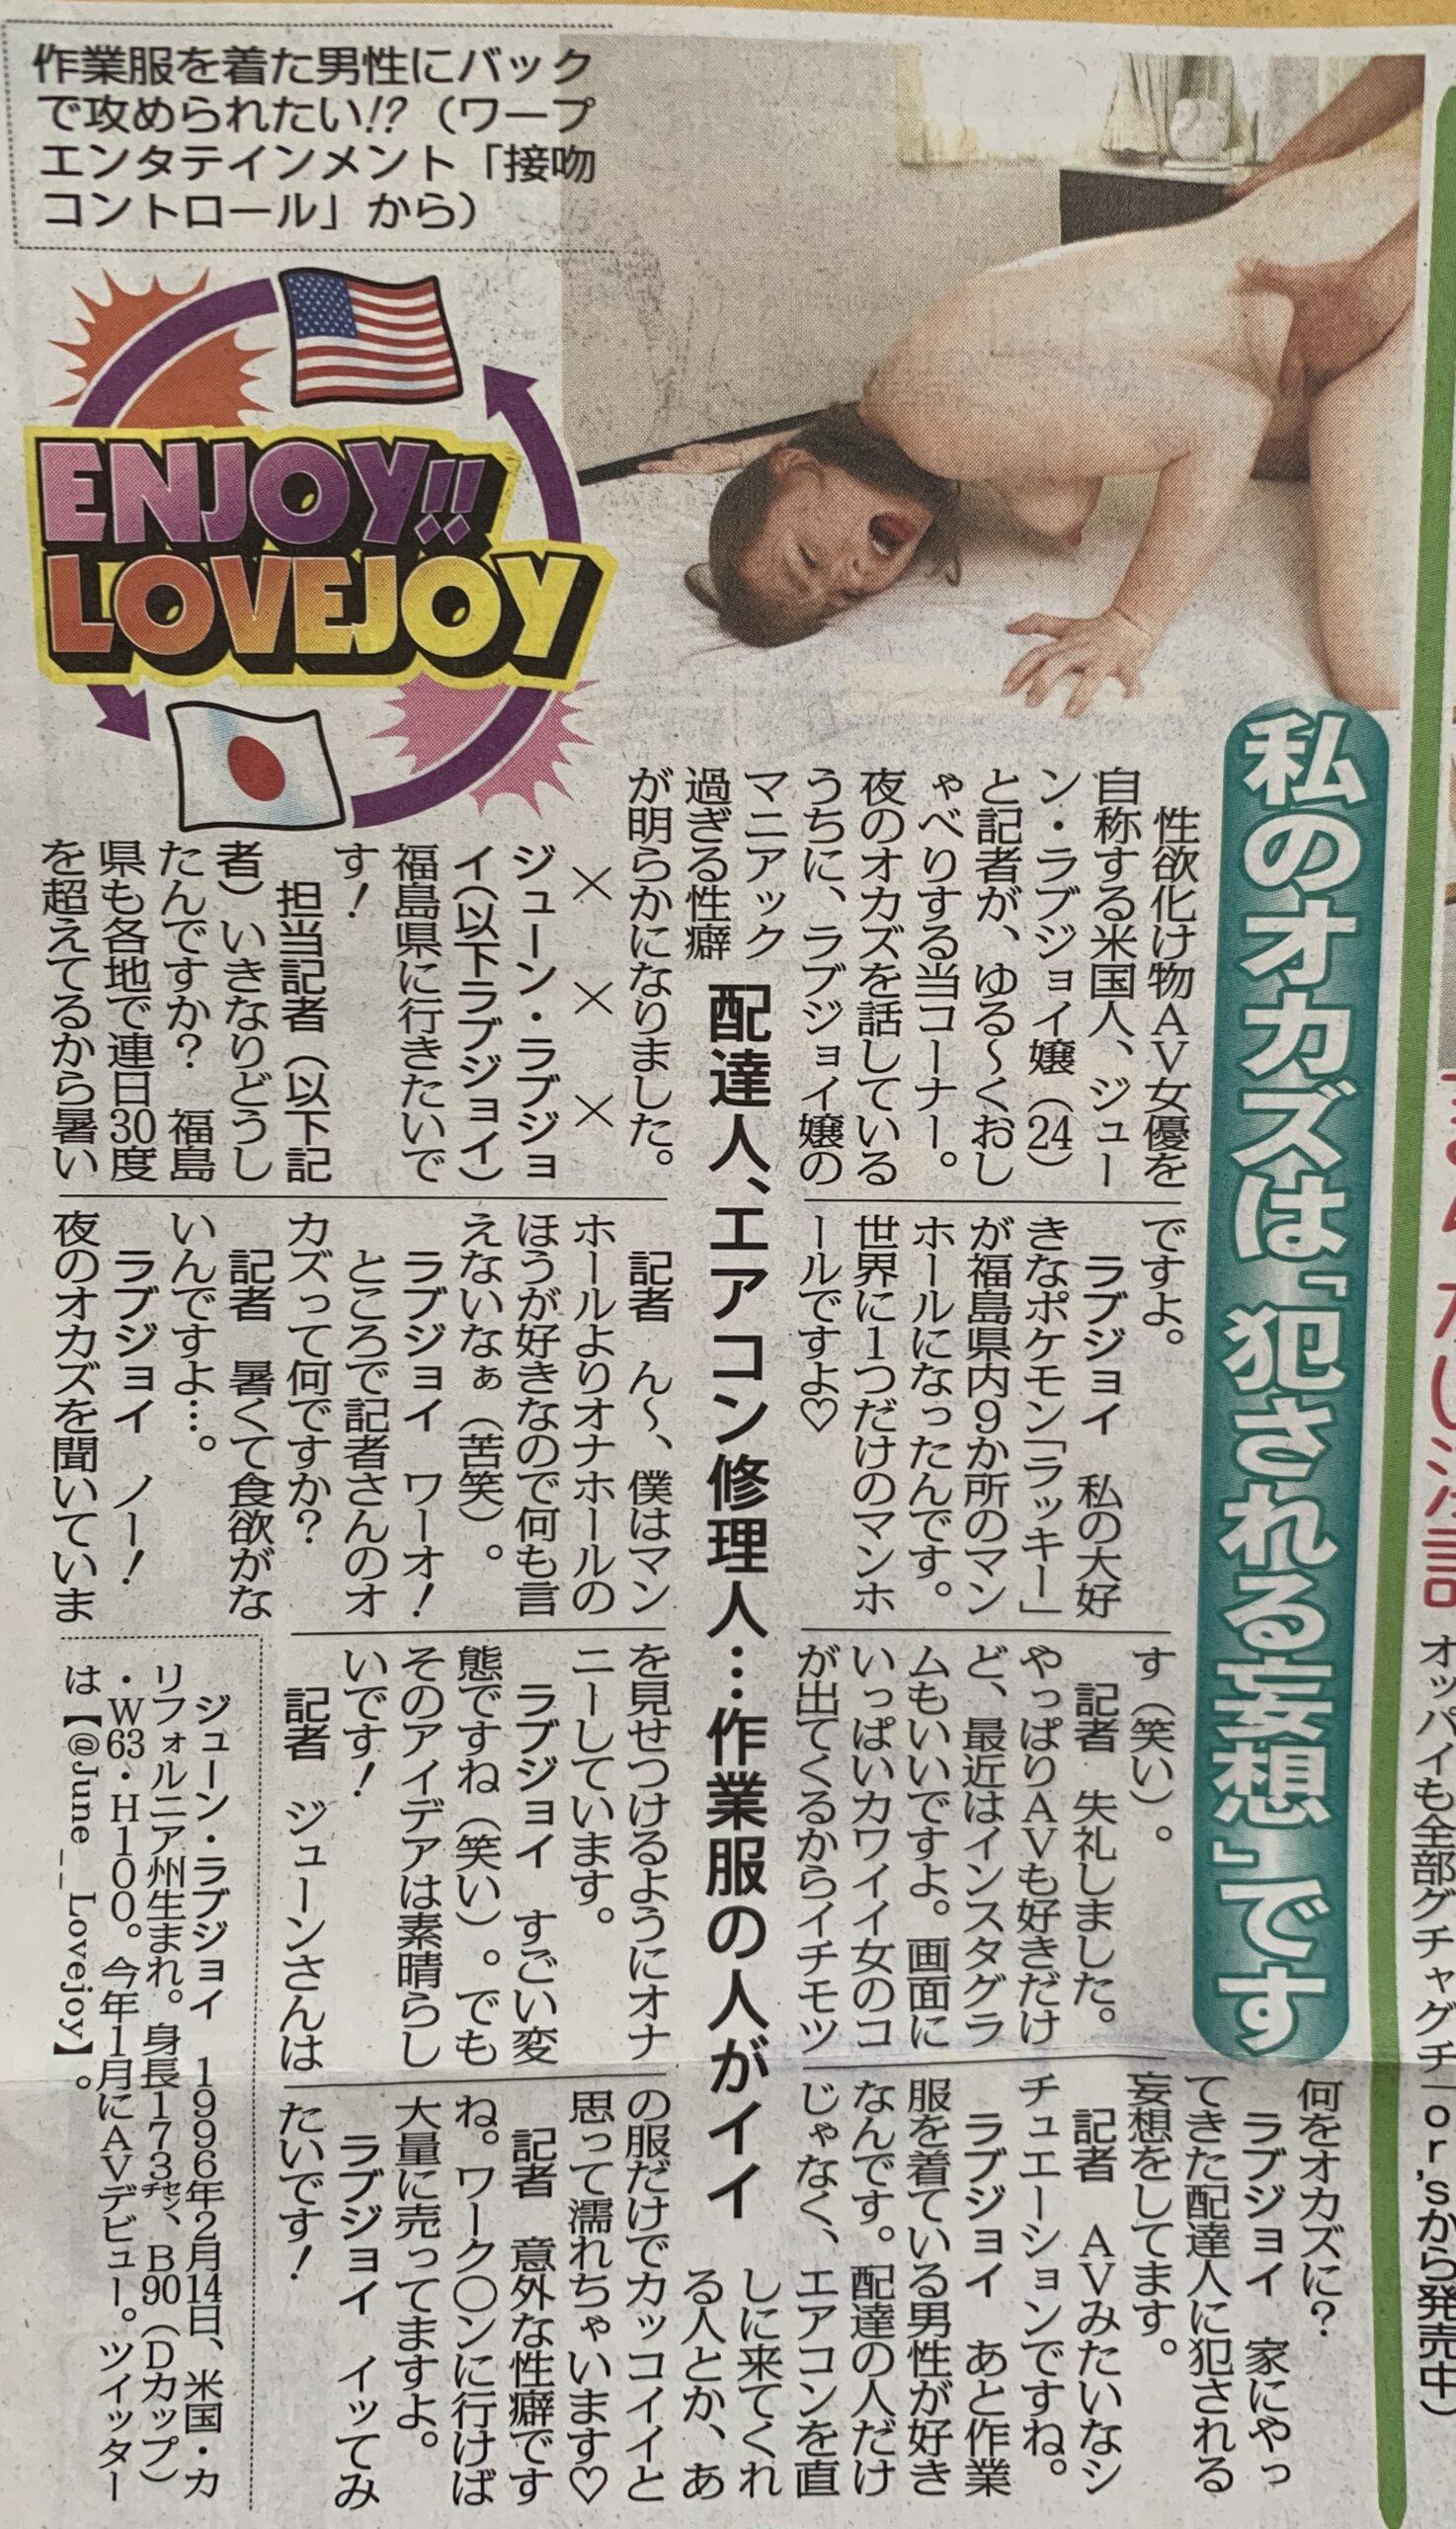 Tokyo Sports ENJOY!!LOVEJOY 8/16/2020